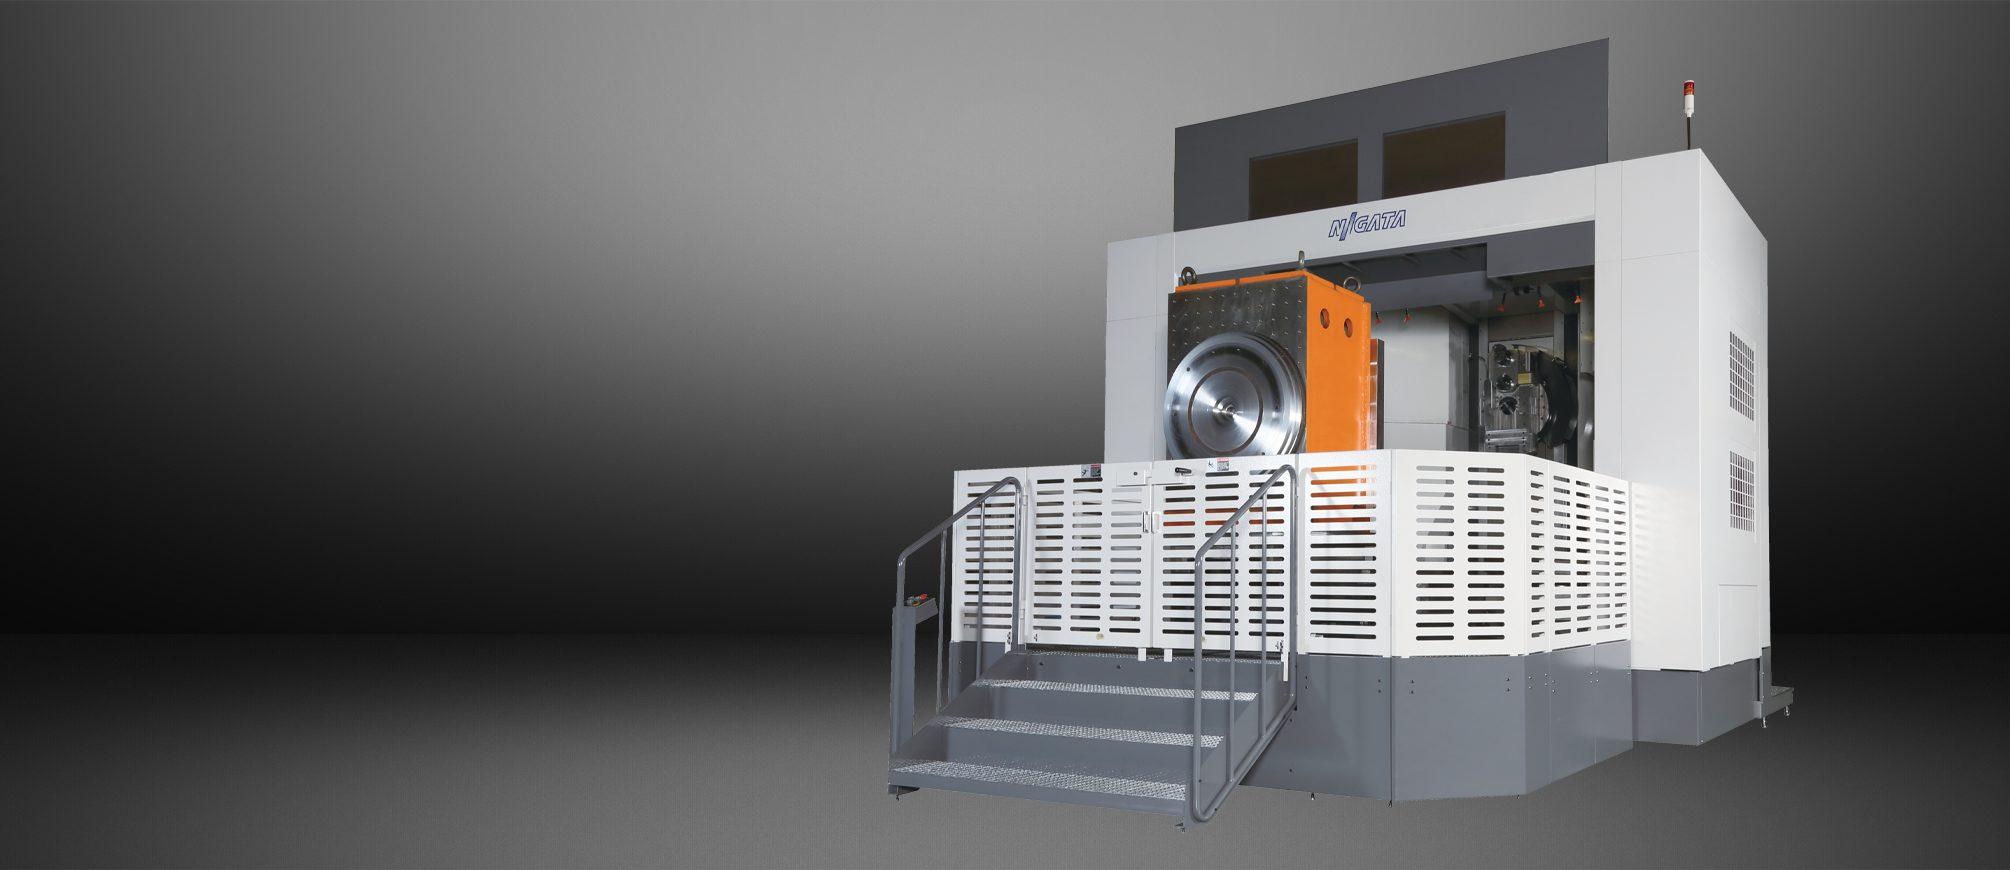 HN80D-II FC Horizontal Machining Centers